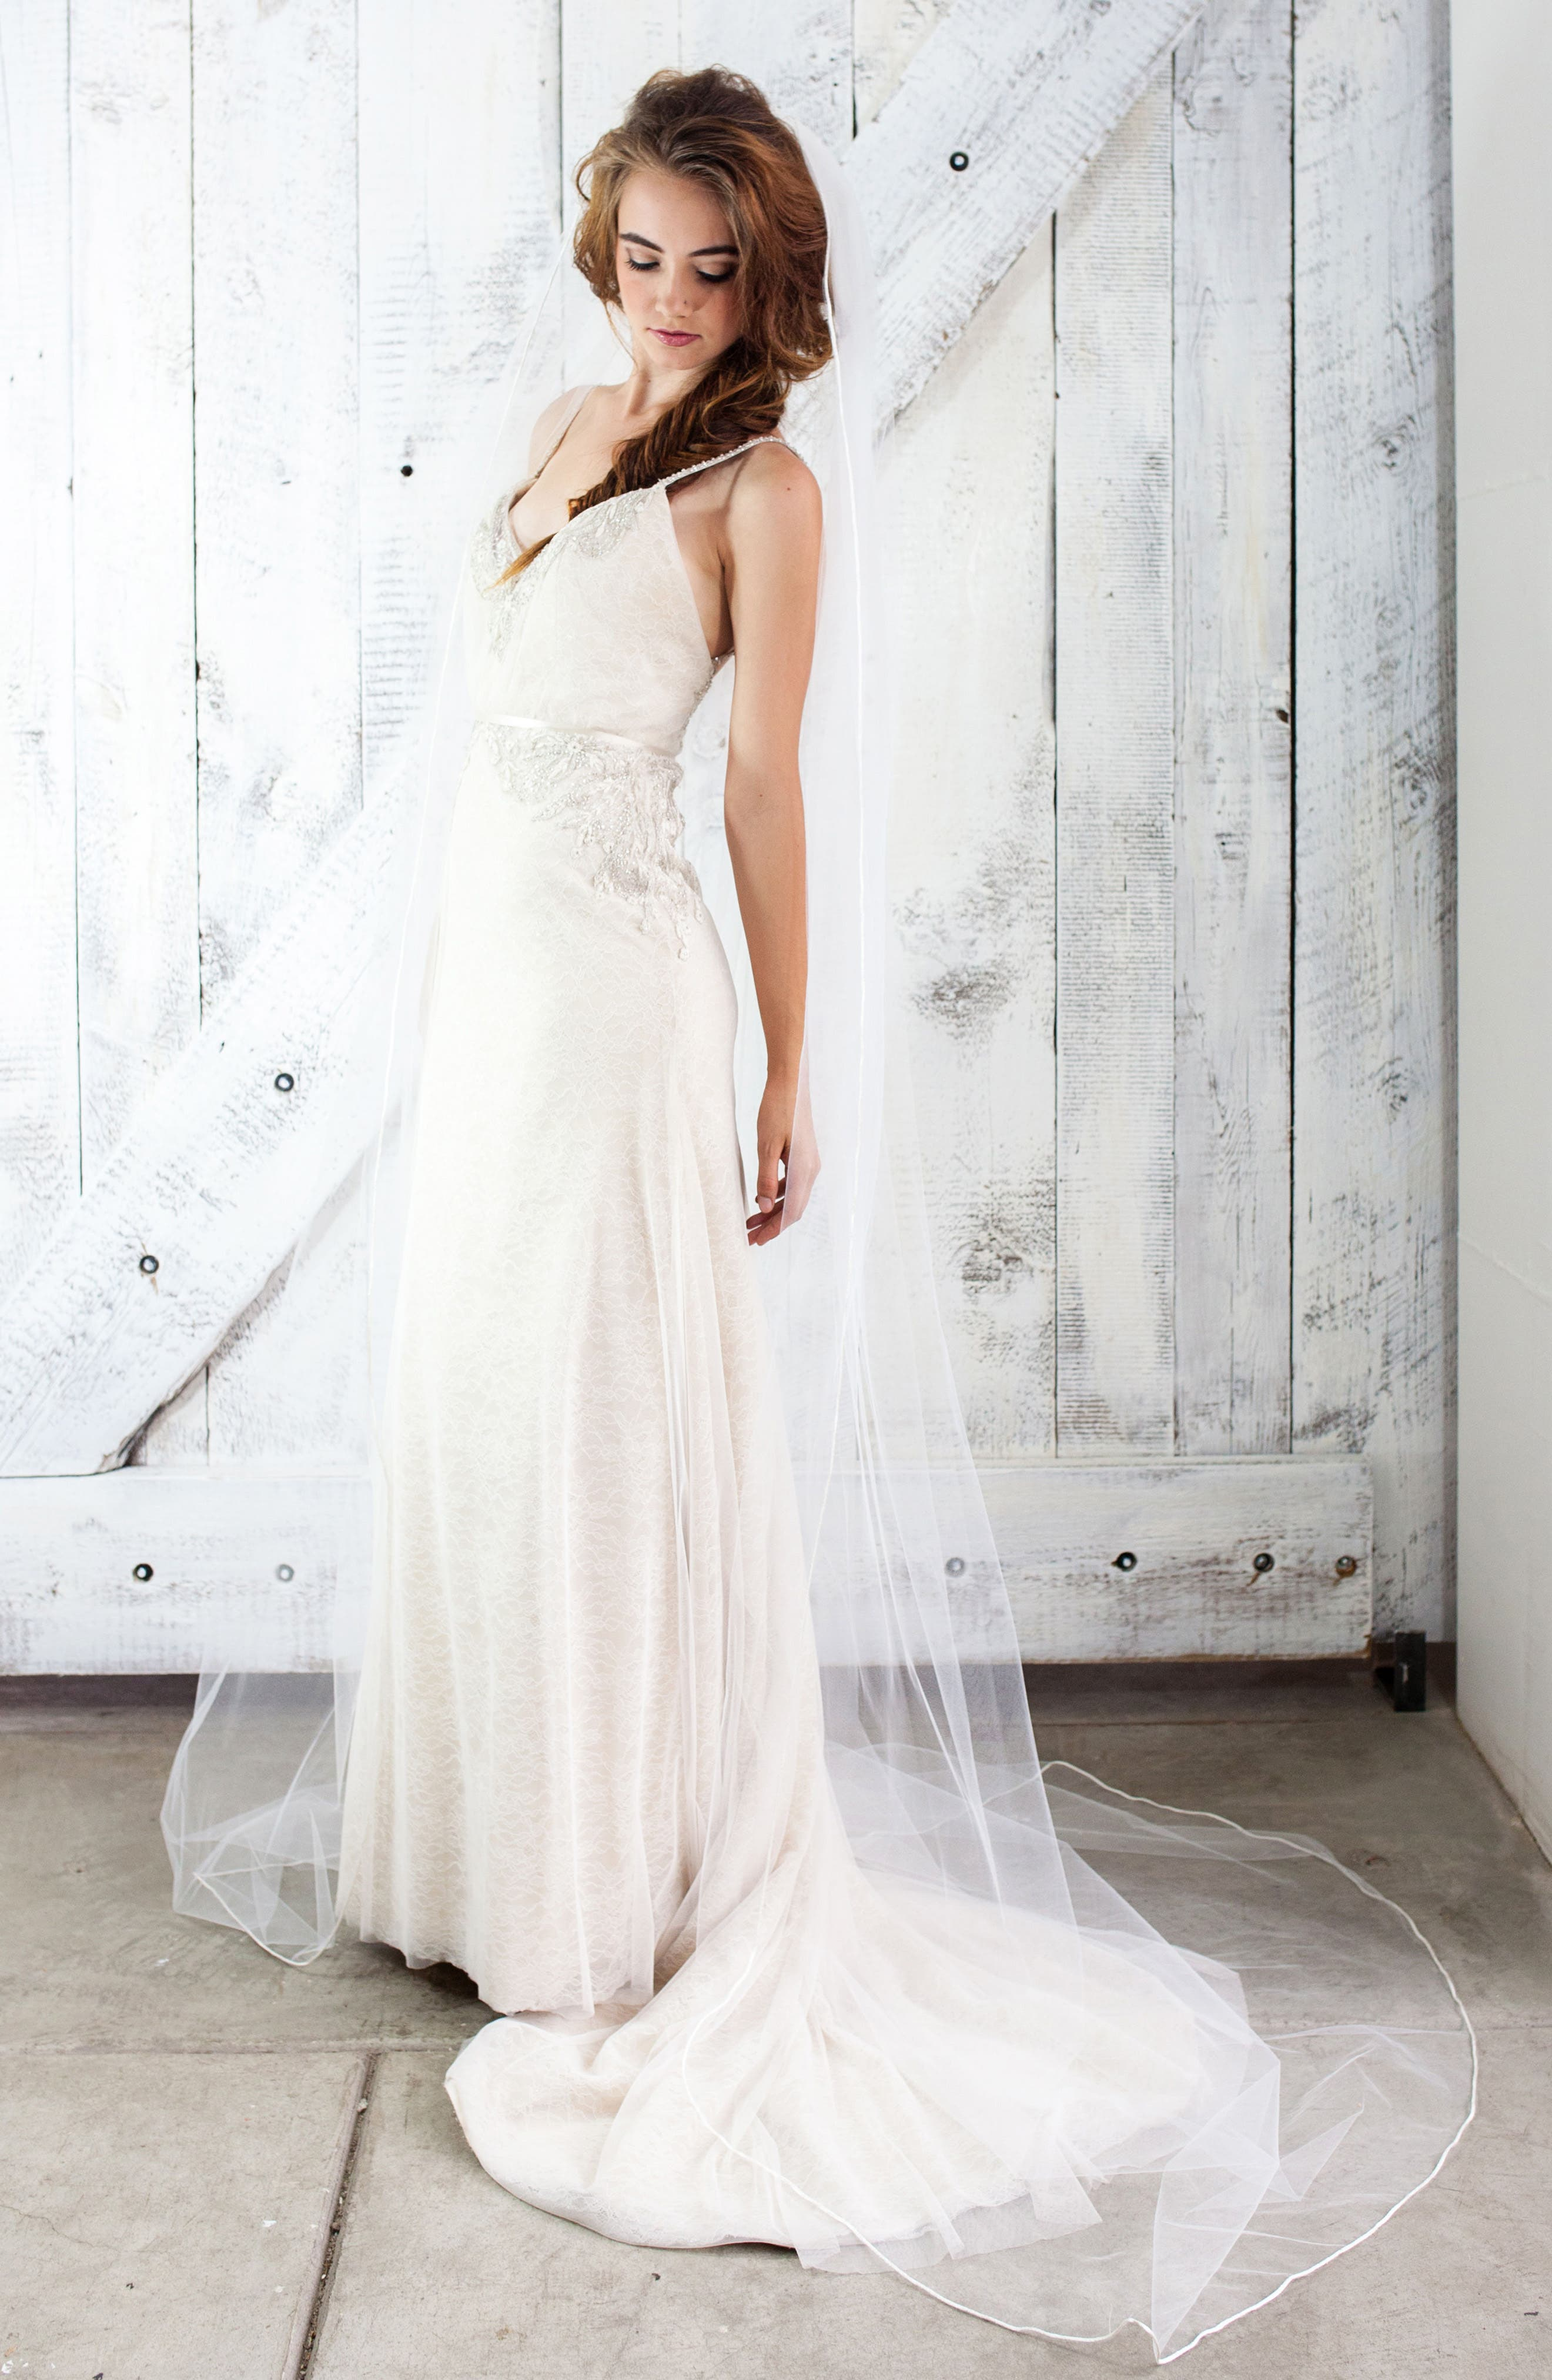 VEIL TRENDS Kauai Mesh Bridal Veil